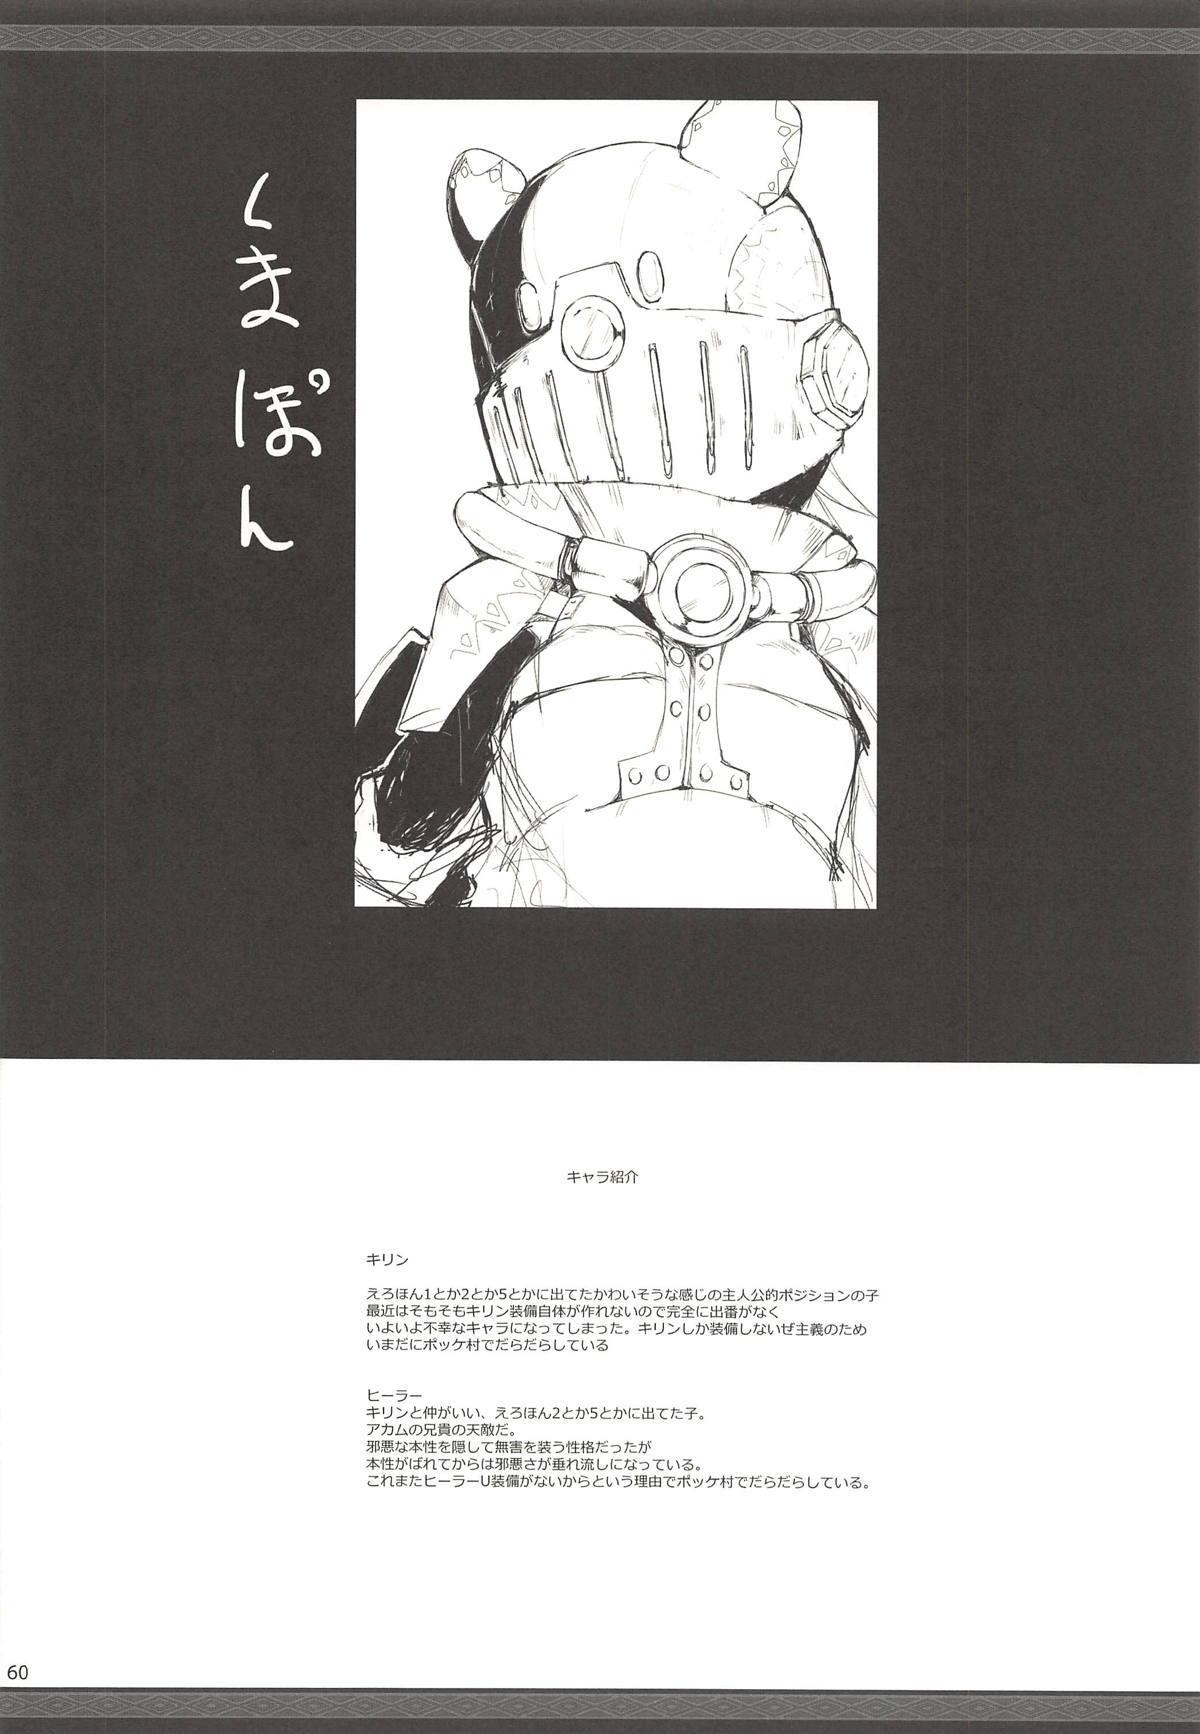 Monhan no Erohon G3 11→14+Juuhi+Omakebon Soushuuhen 58